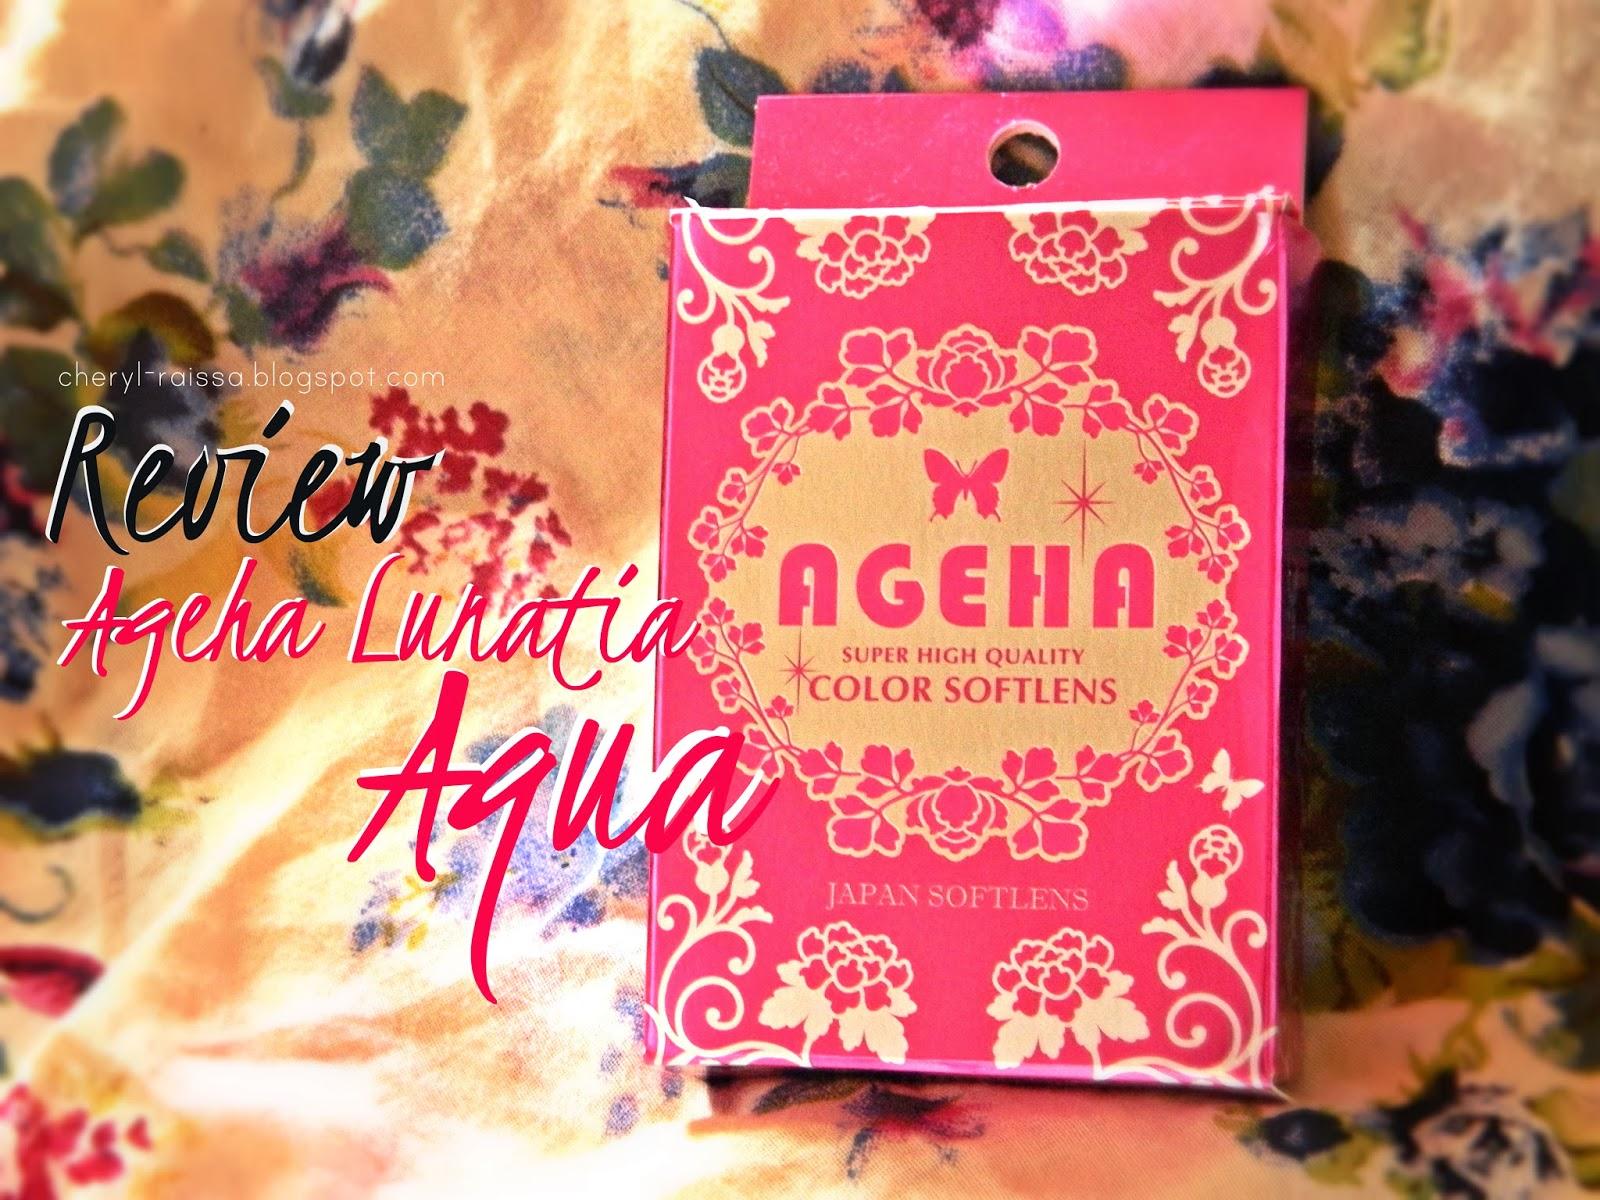 Makeup Tutorial Romantic Look For Day Ageha Lunatia Air Softlens Nice 60 Ml Aqua Video